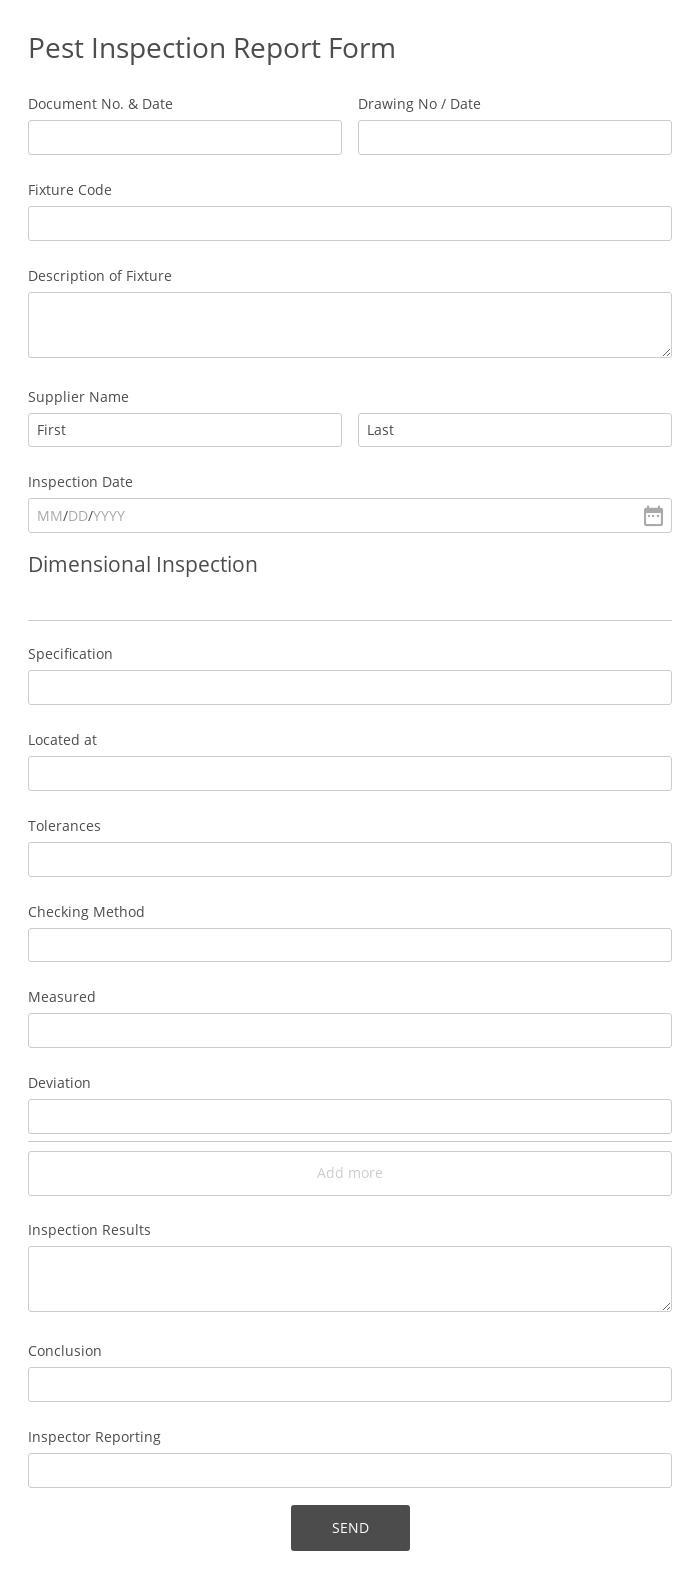 Pest Inspection Report Form